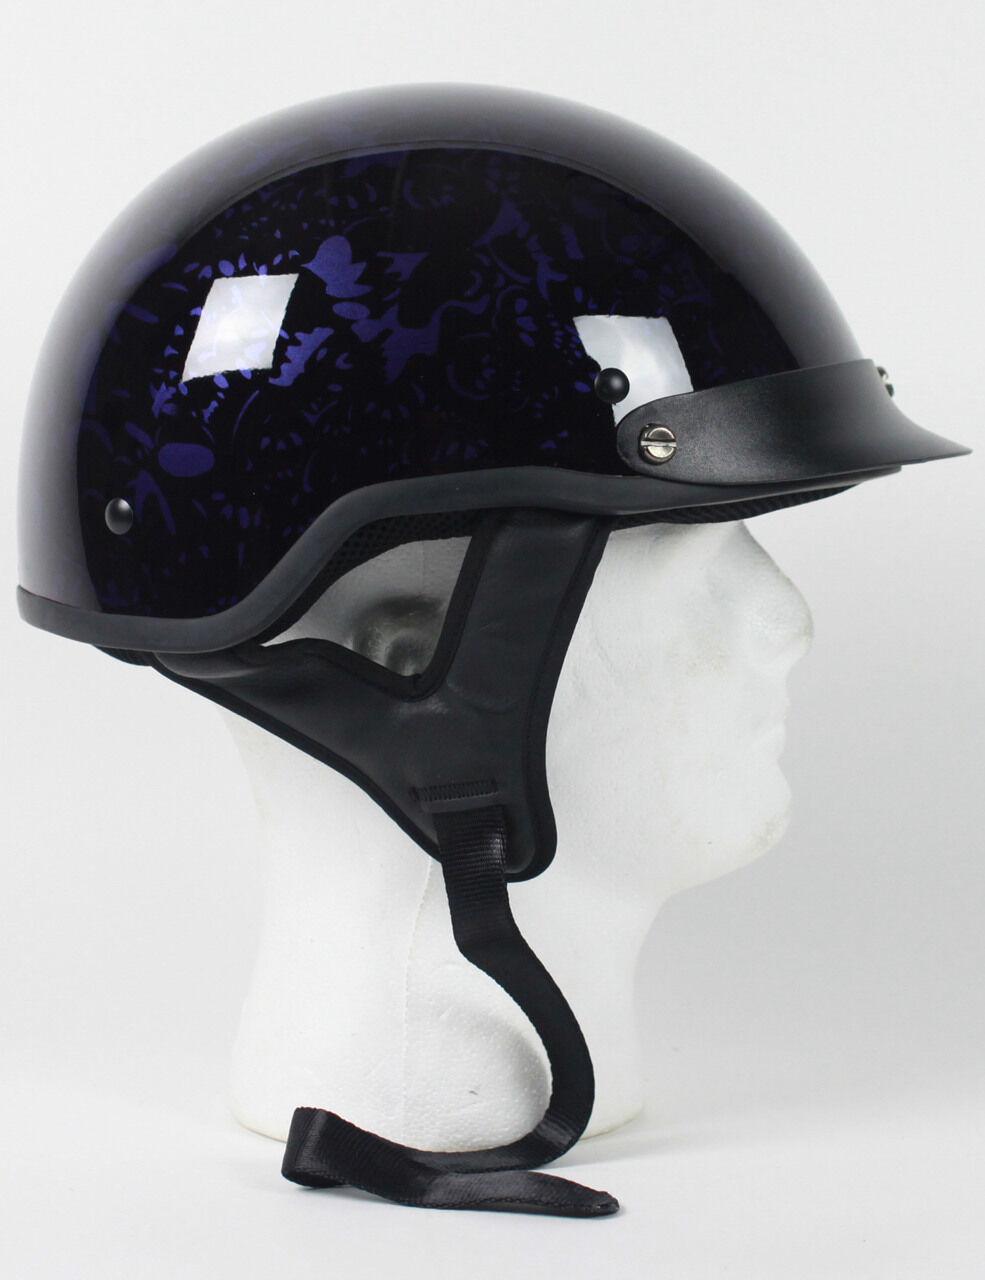 DOT PURPLE  BONEYARD  MOTORCYCLE HALF HELMET BEANIE HELMETS SHORTY LIGHTER NEW  world famous sale online